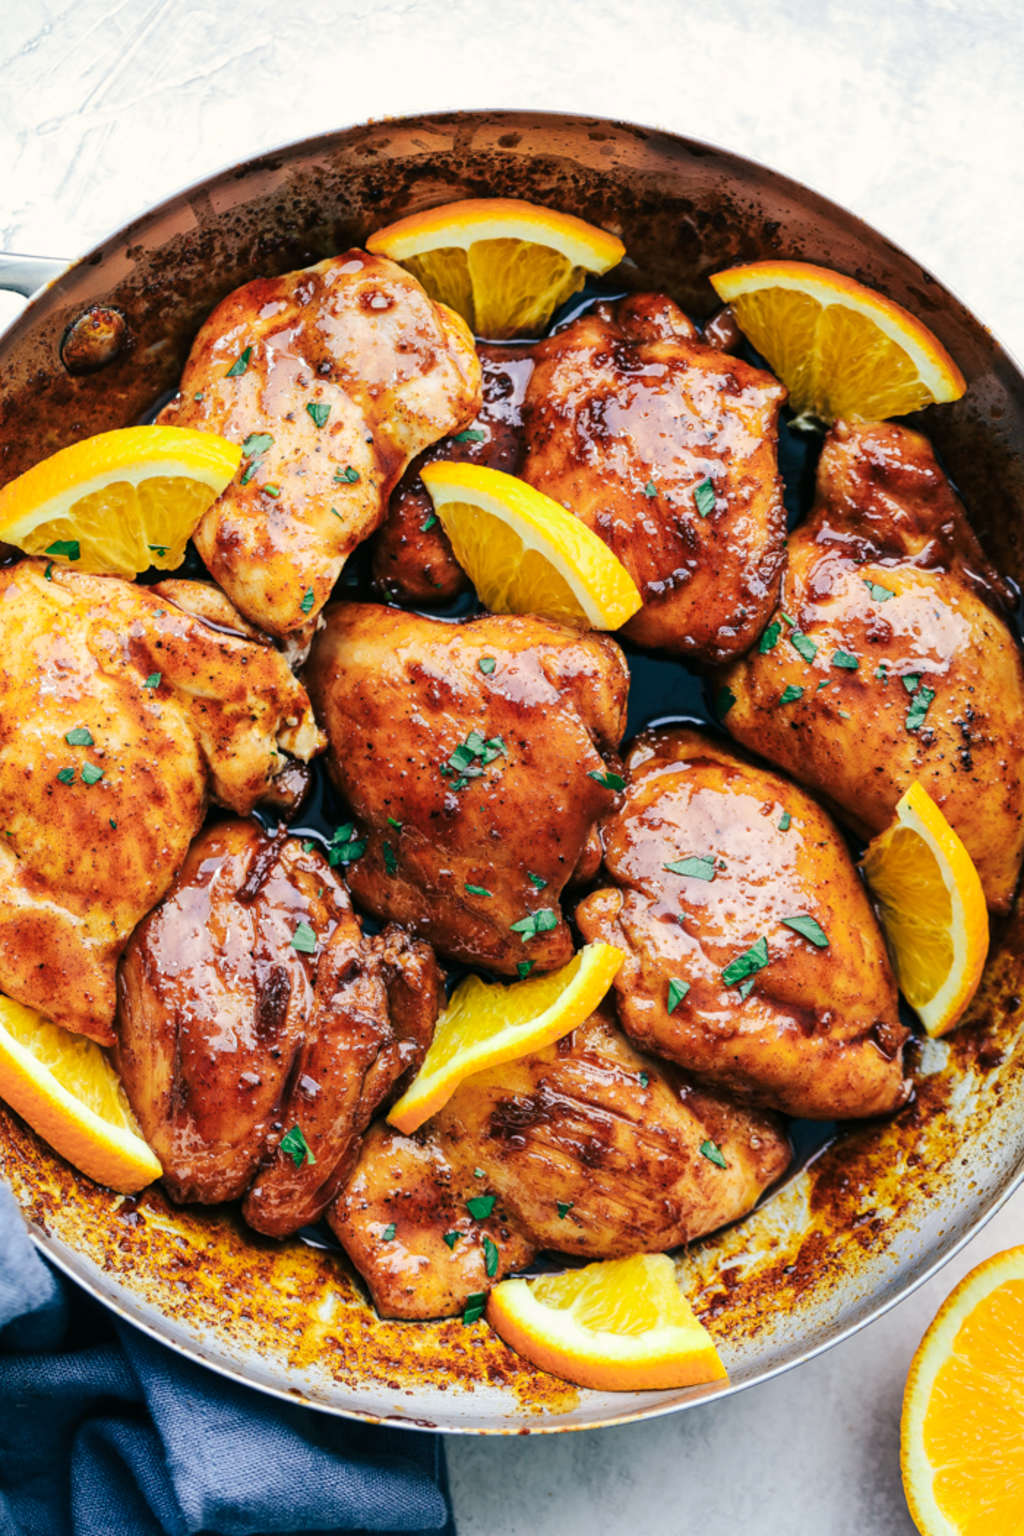 Make This Honey-Orange Skillet Chicken for Dinner Tonight